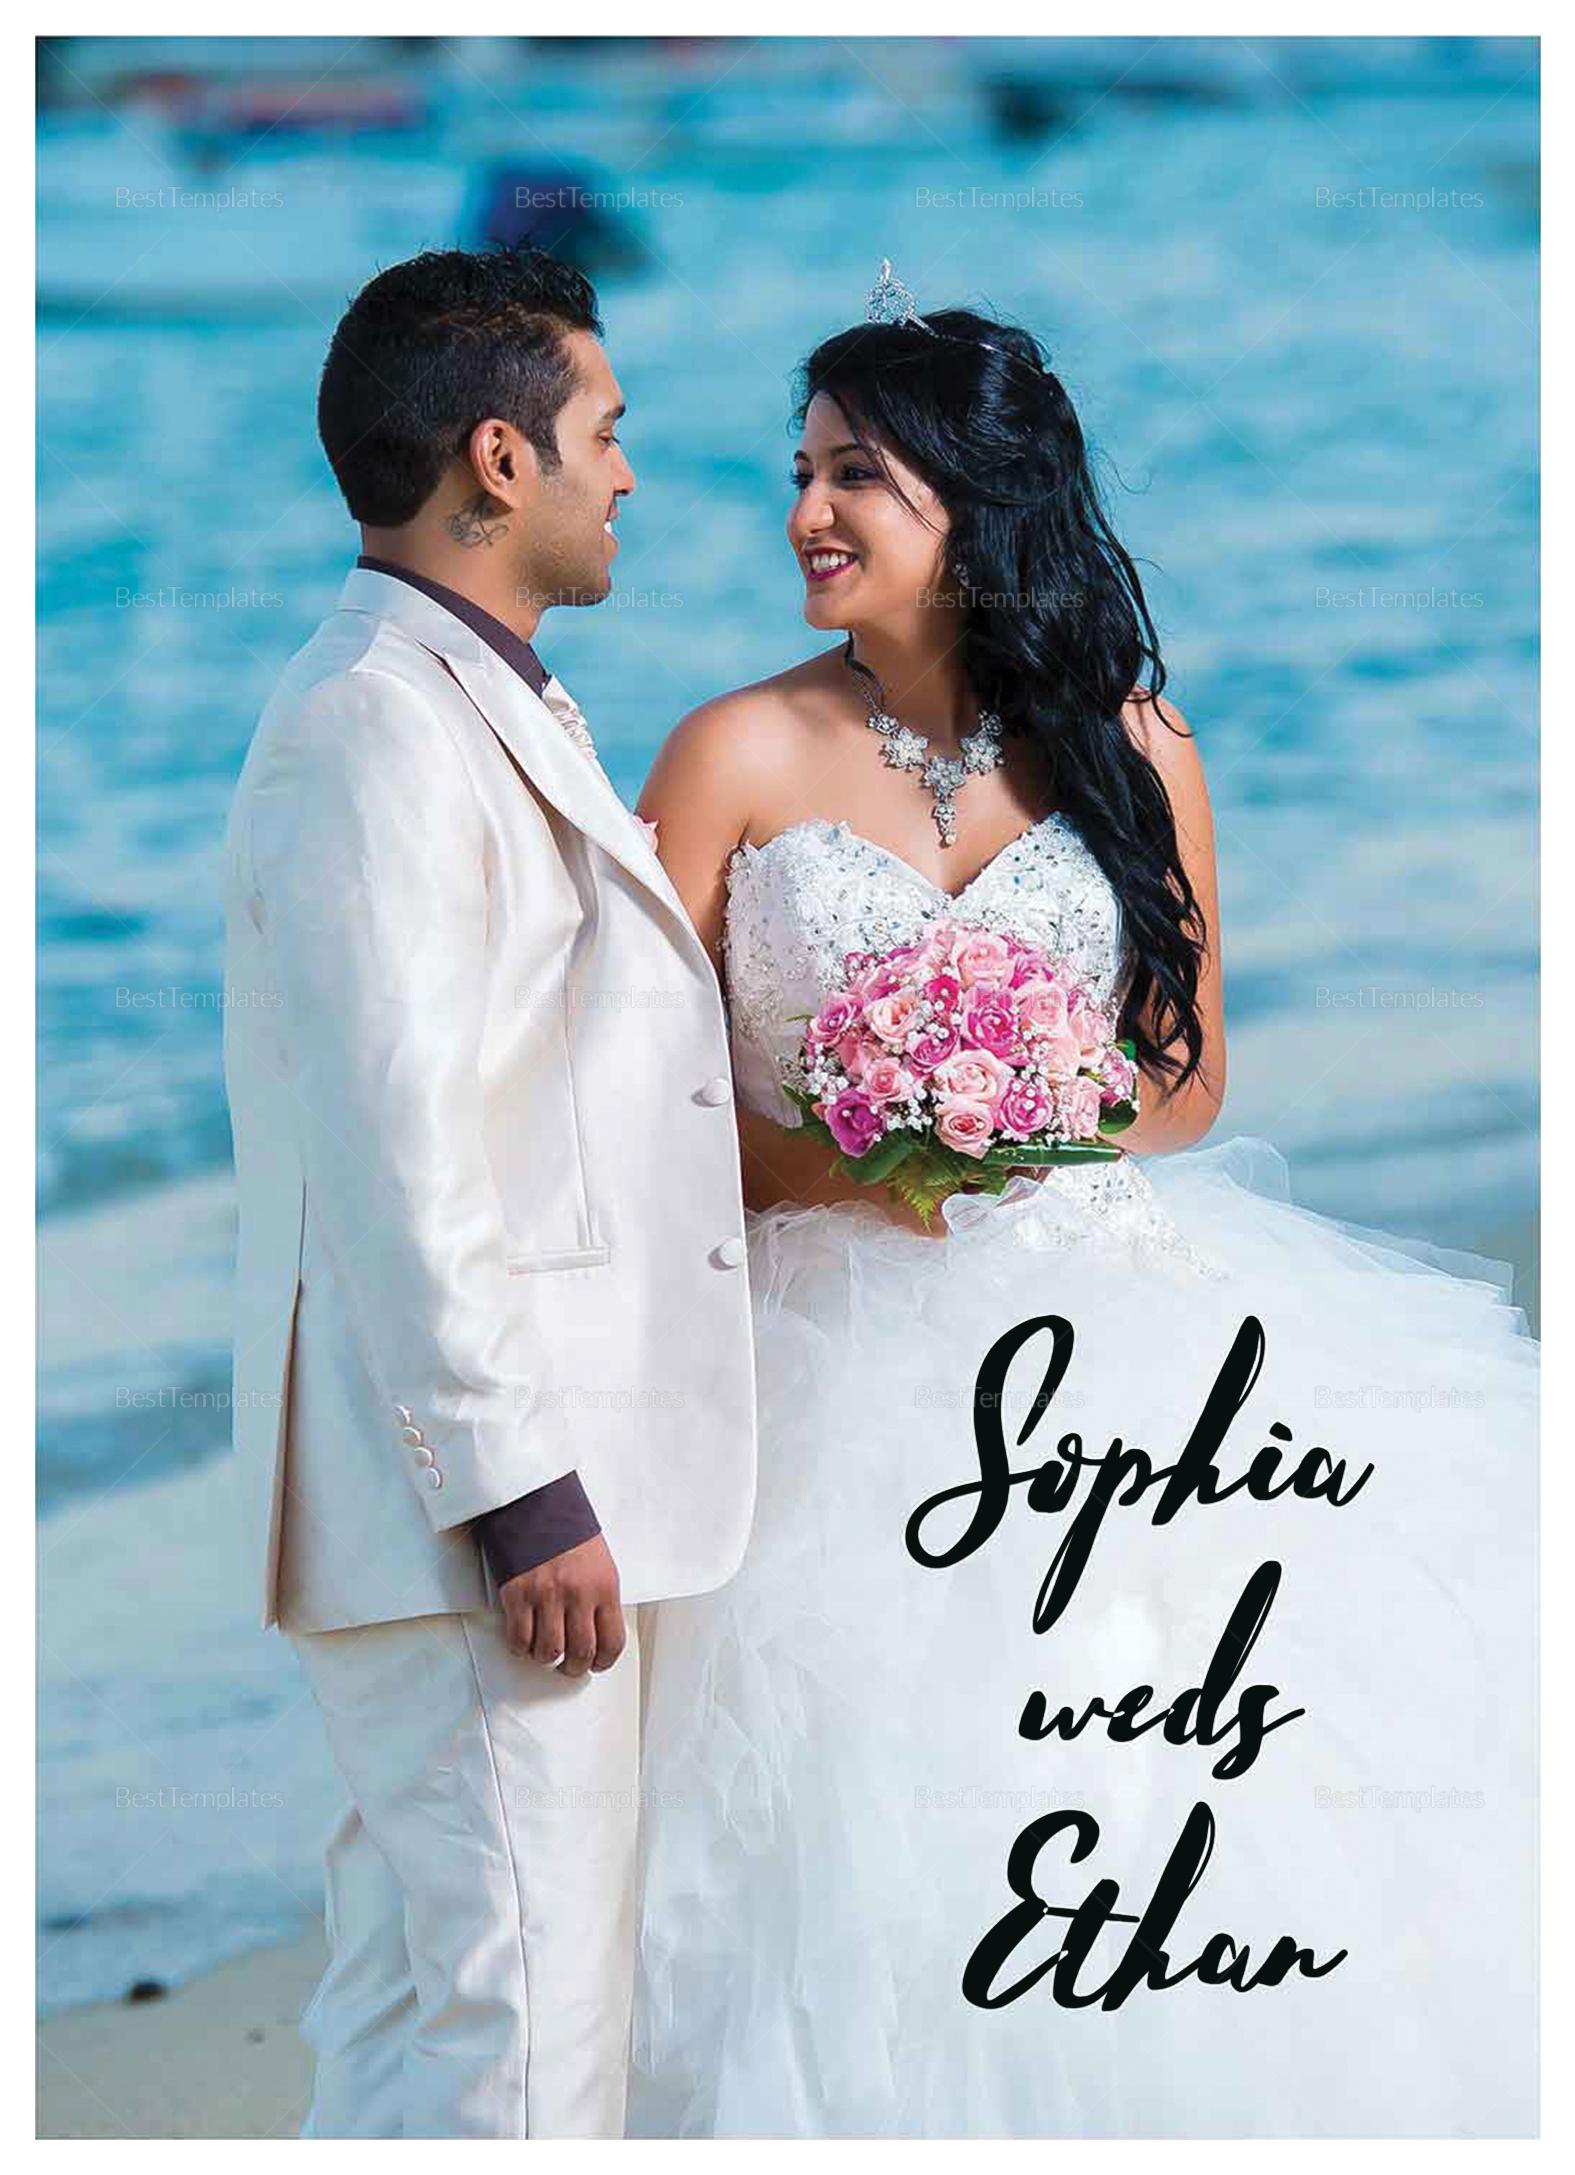 Wedding Photography Invitation